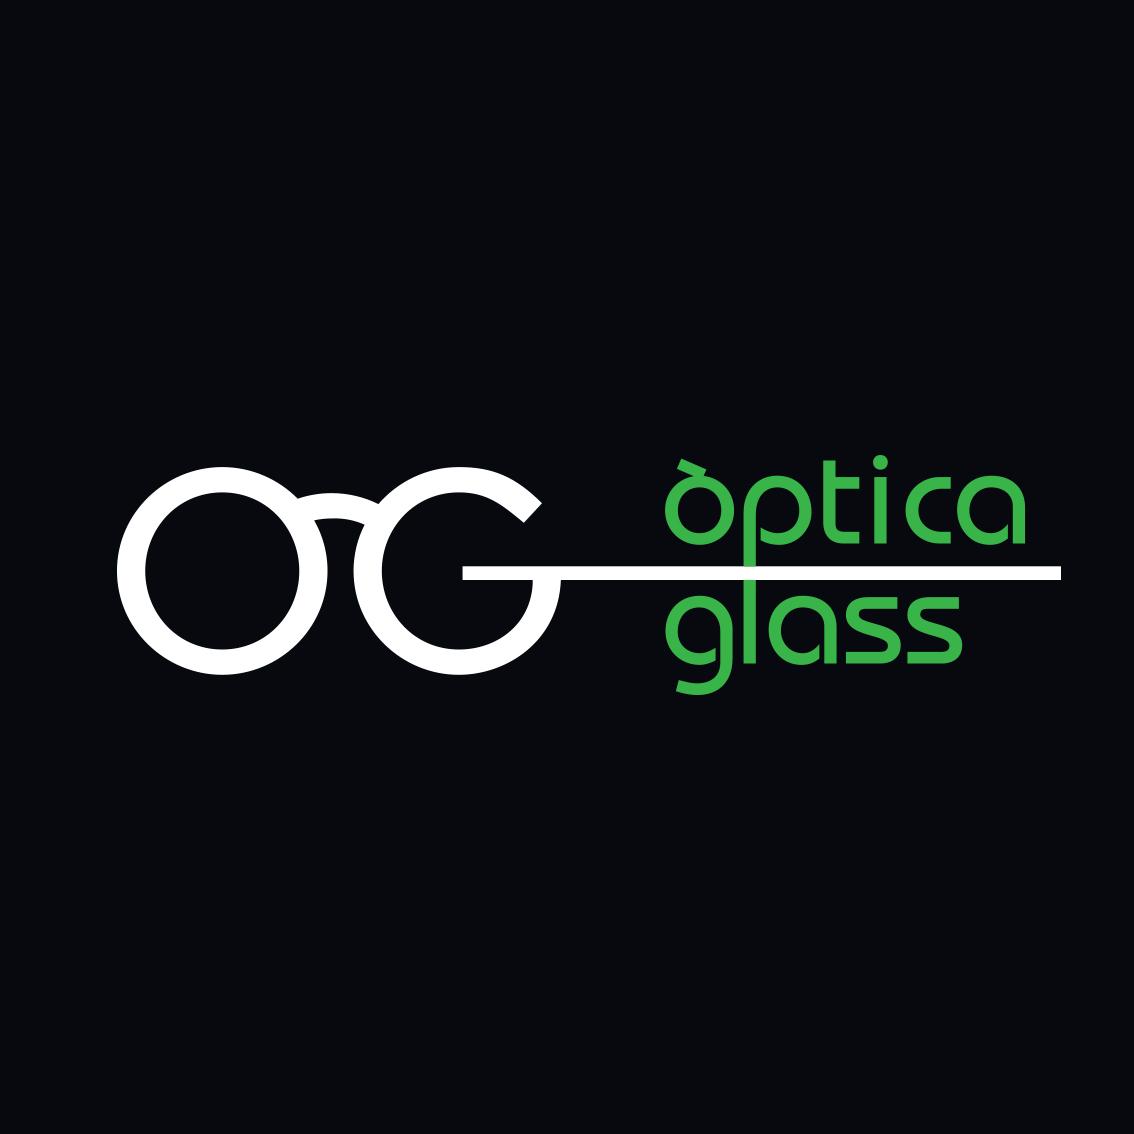 Logo comerç Òptica Glass